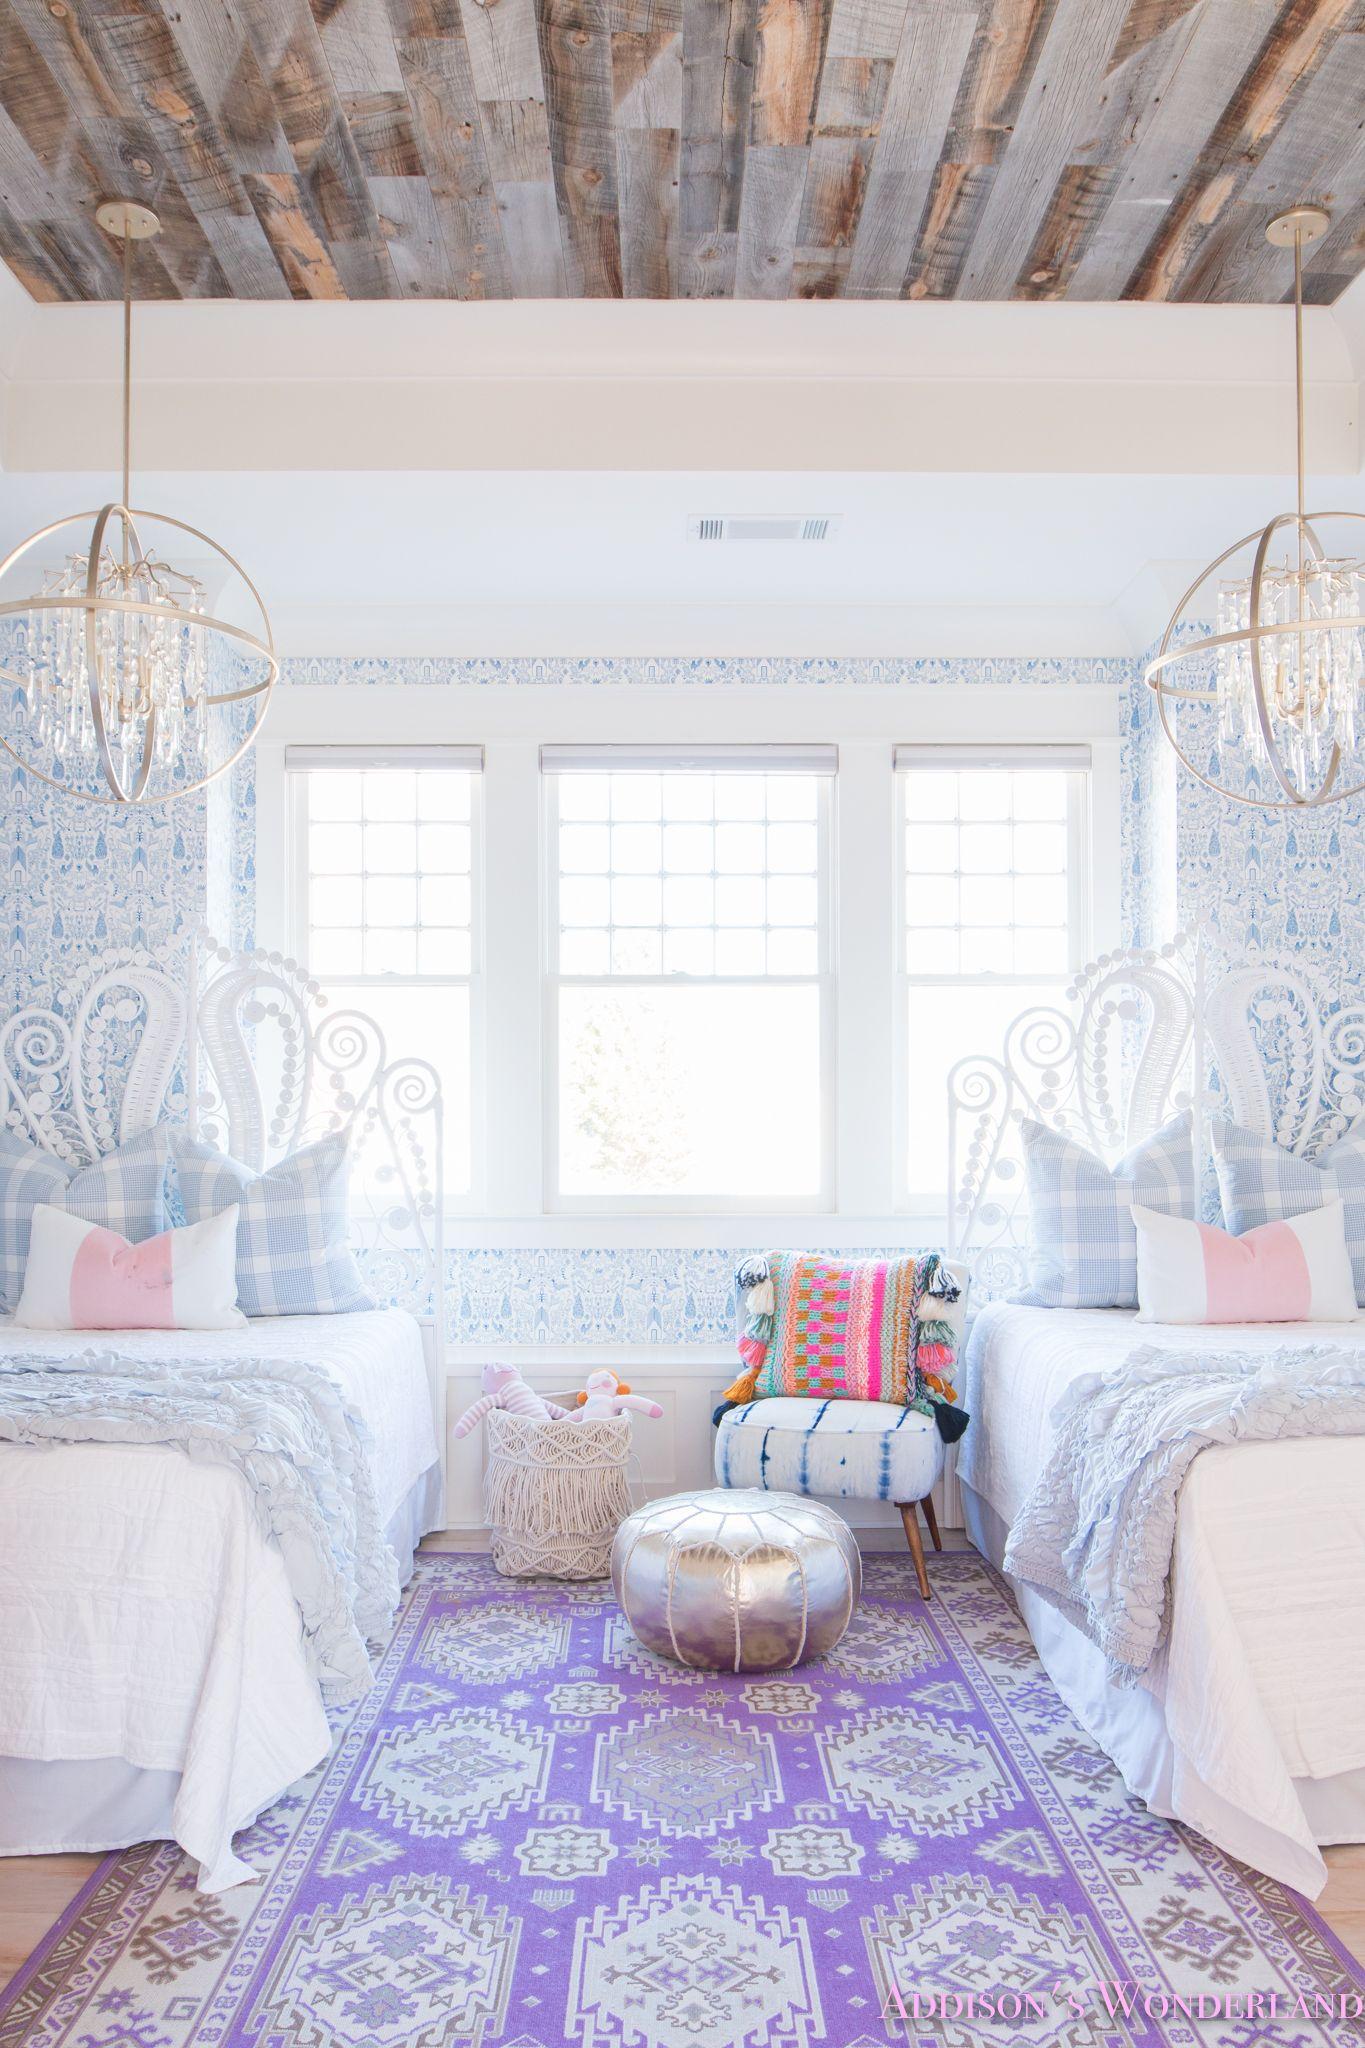 3 window bedroom ideas   home decor trends black and white u macrame  kitchen ideas